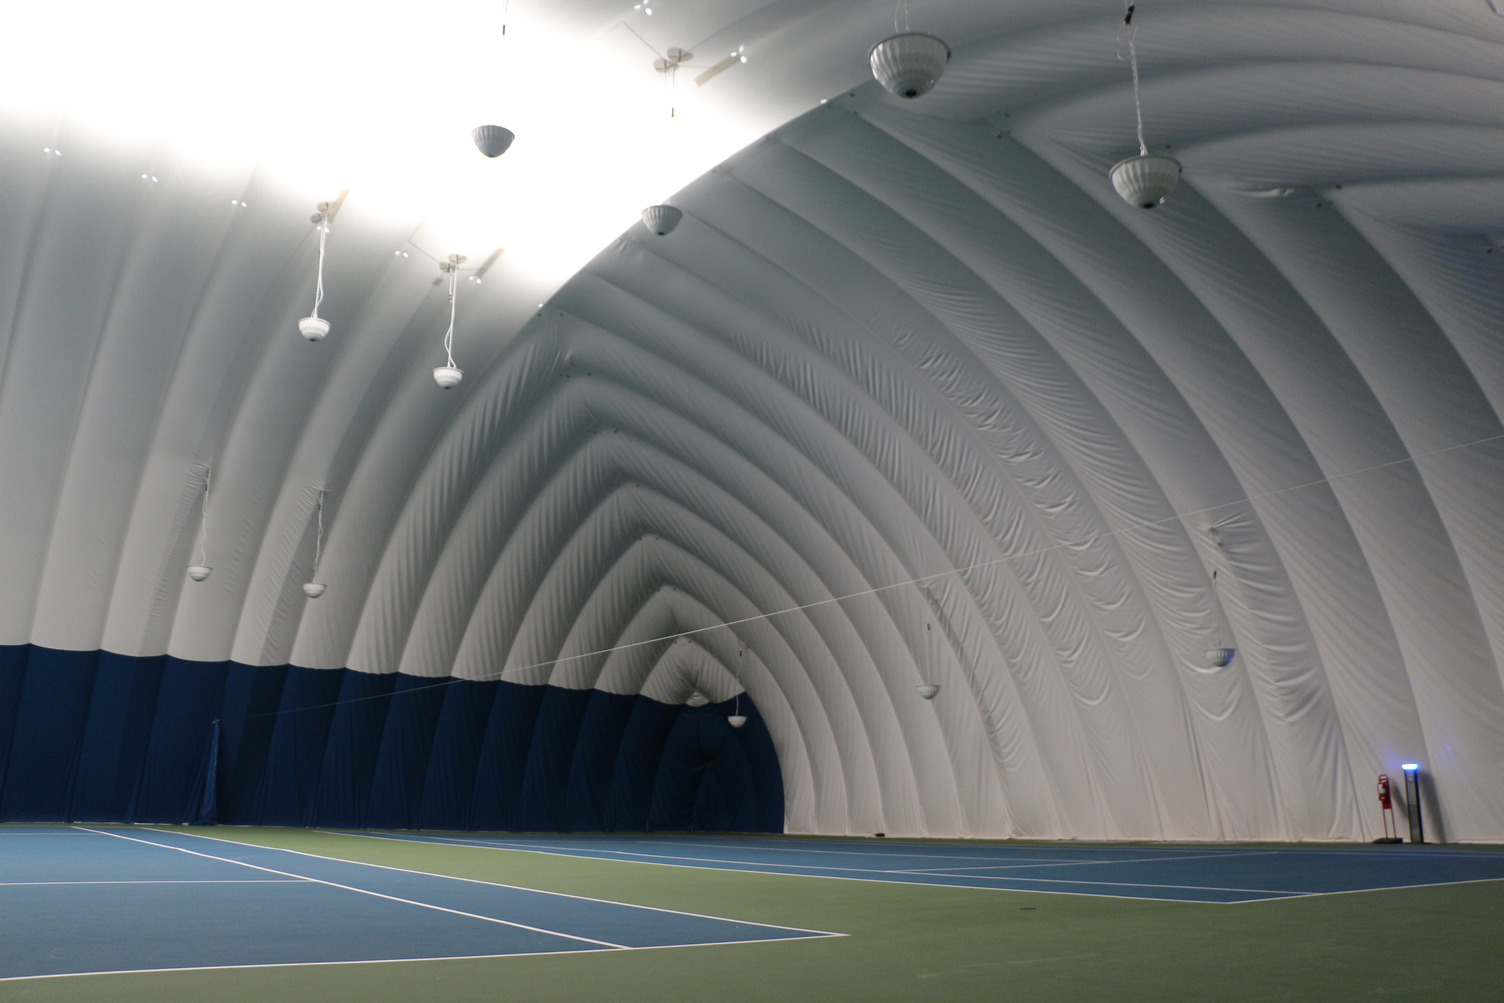 DuPont Tedlar Wallcovering Film Drexel University Vidas Athletic Field Inflatable Dome Interior Courts